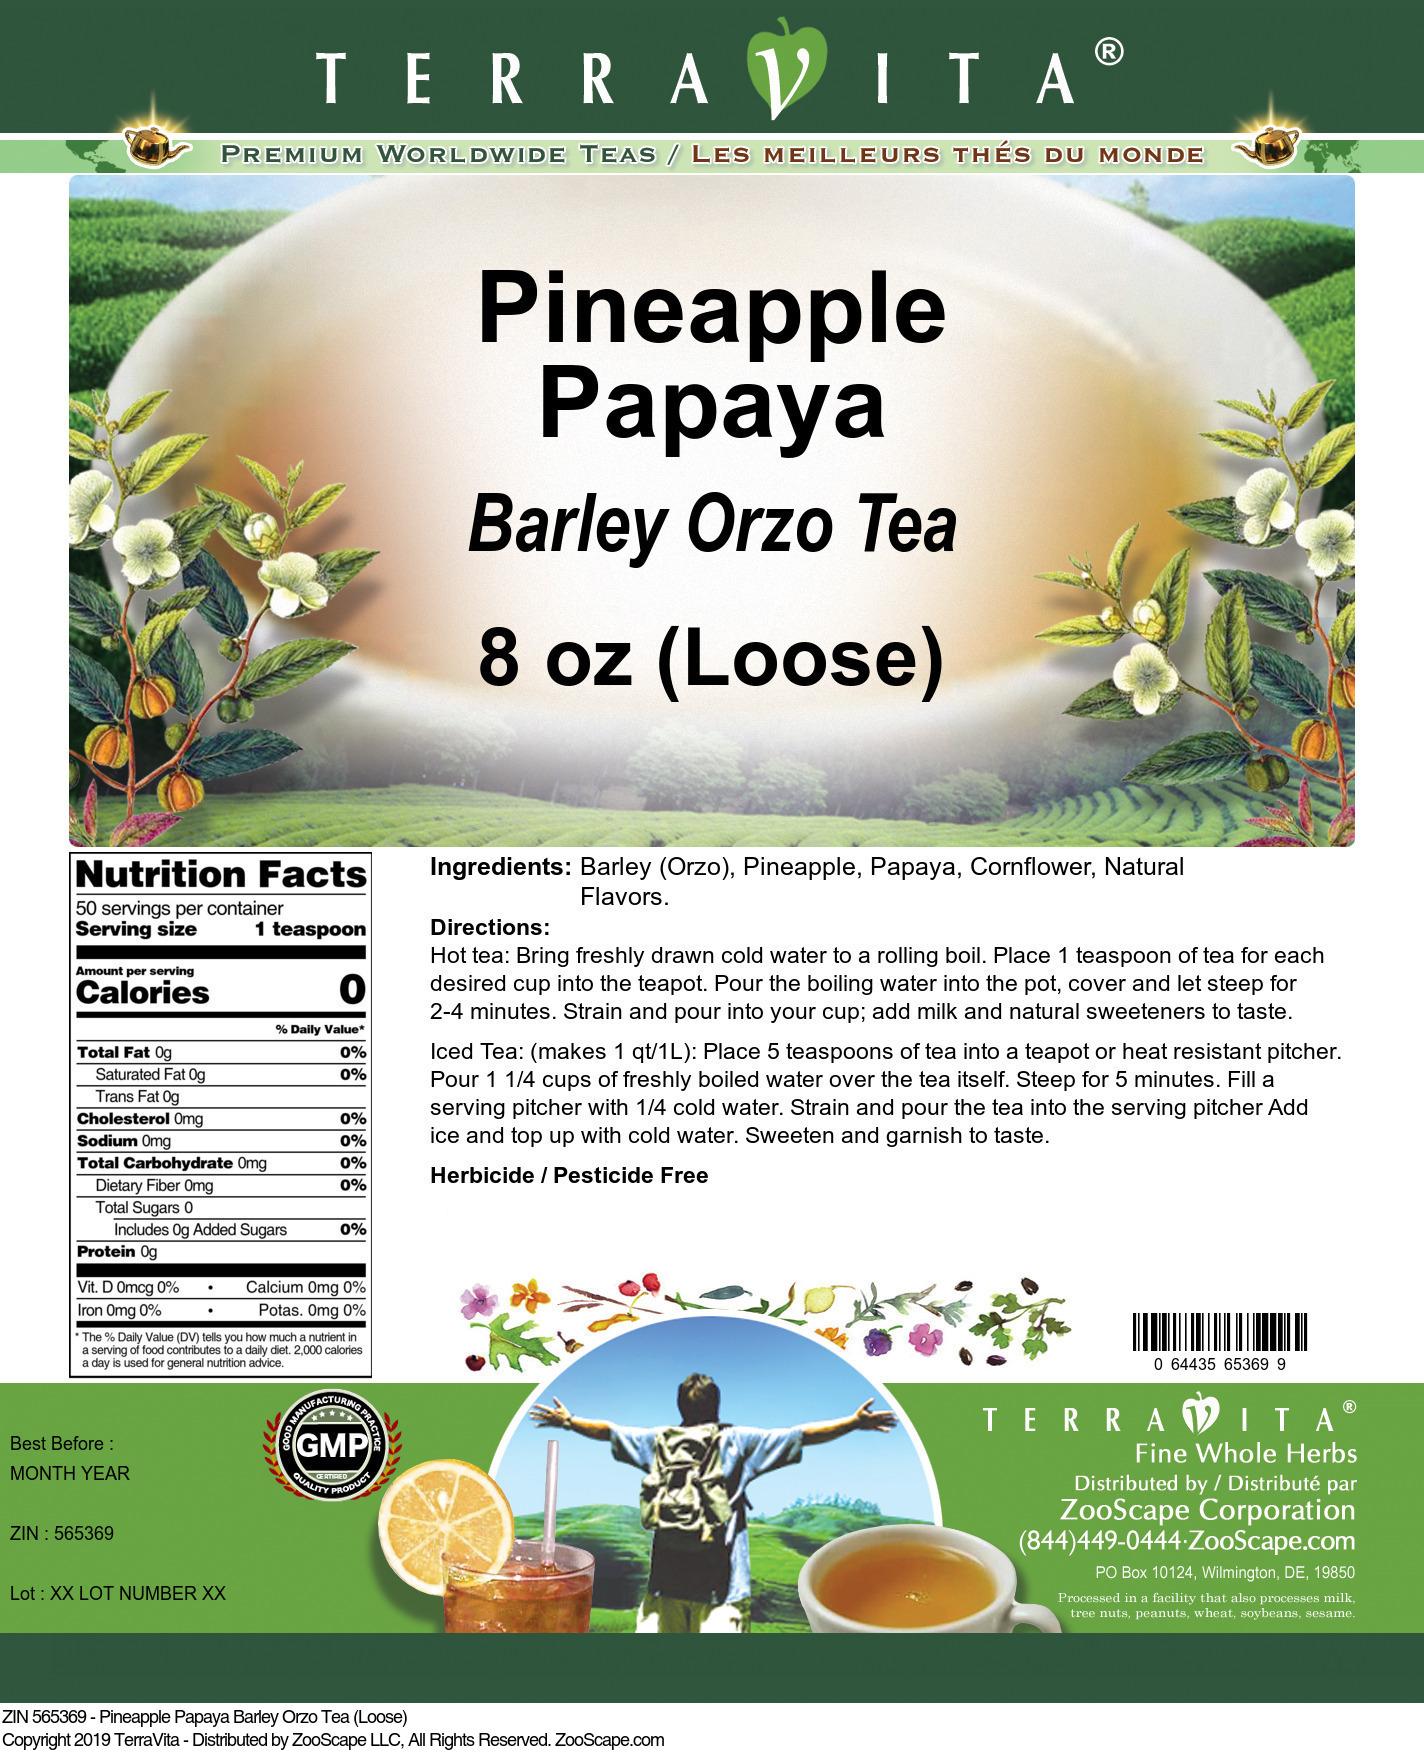 Pineapple Papaya Barley Orzo Tea (Loose)